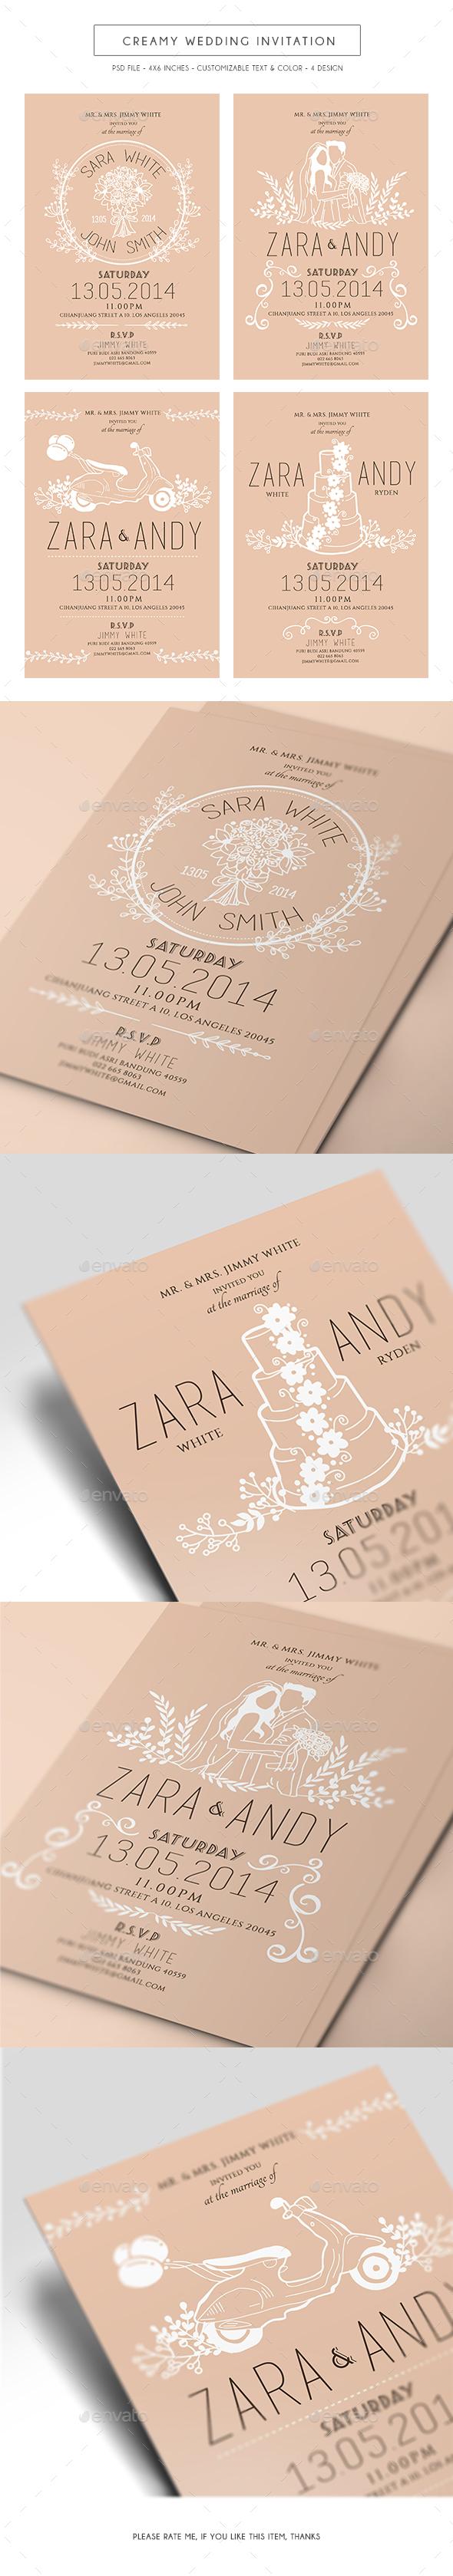 Creamy Wedding Invitation